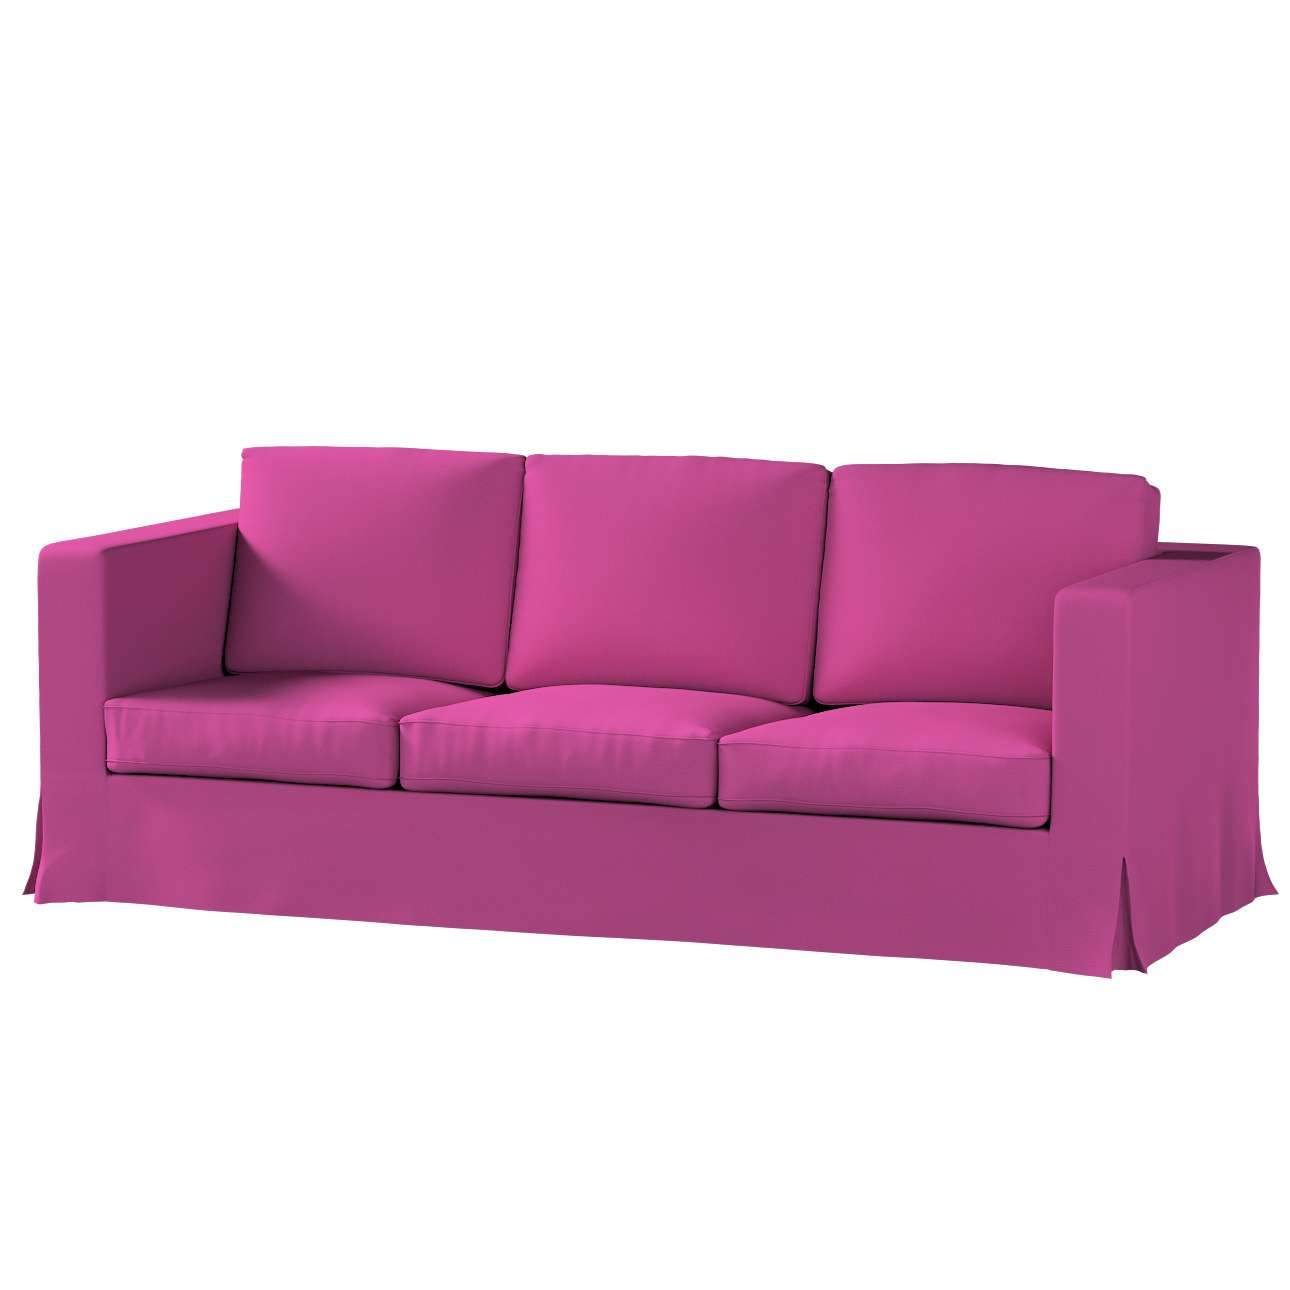 Karlanda 3-Sitzer  Sofabezug nicht ausklappbar lang Sofa Karlanda 3-lang von der Kollektion Etna, Stoff: 705-23